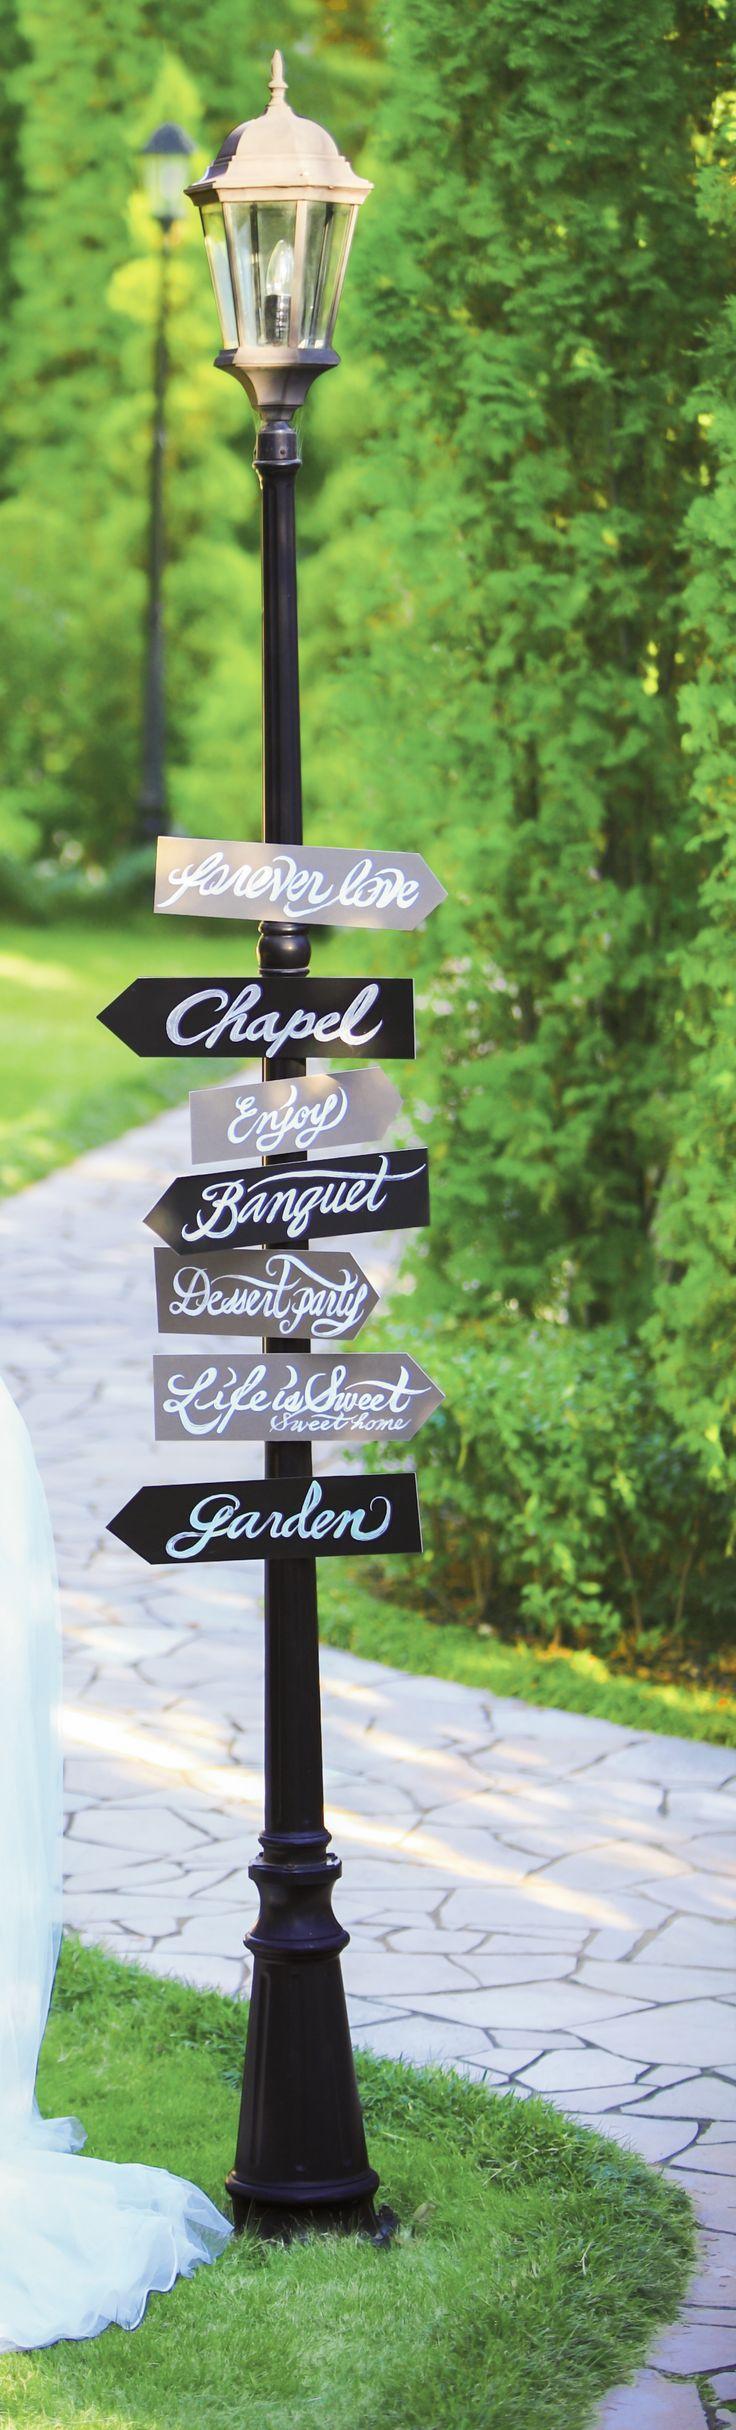 wedding Style natural  #WEDDING #TRUNK #OneHeart #coordinate  #WhitGereen  #natural